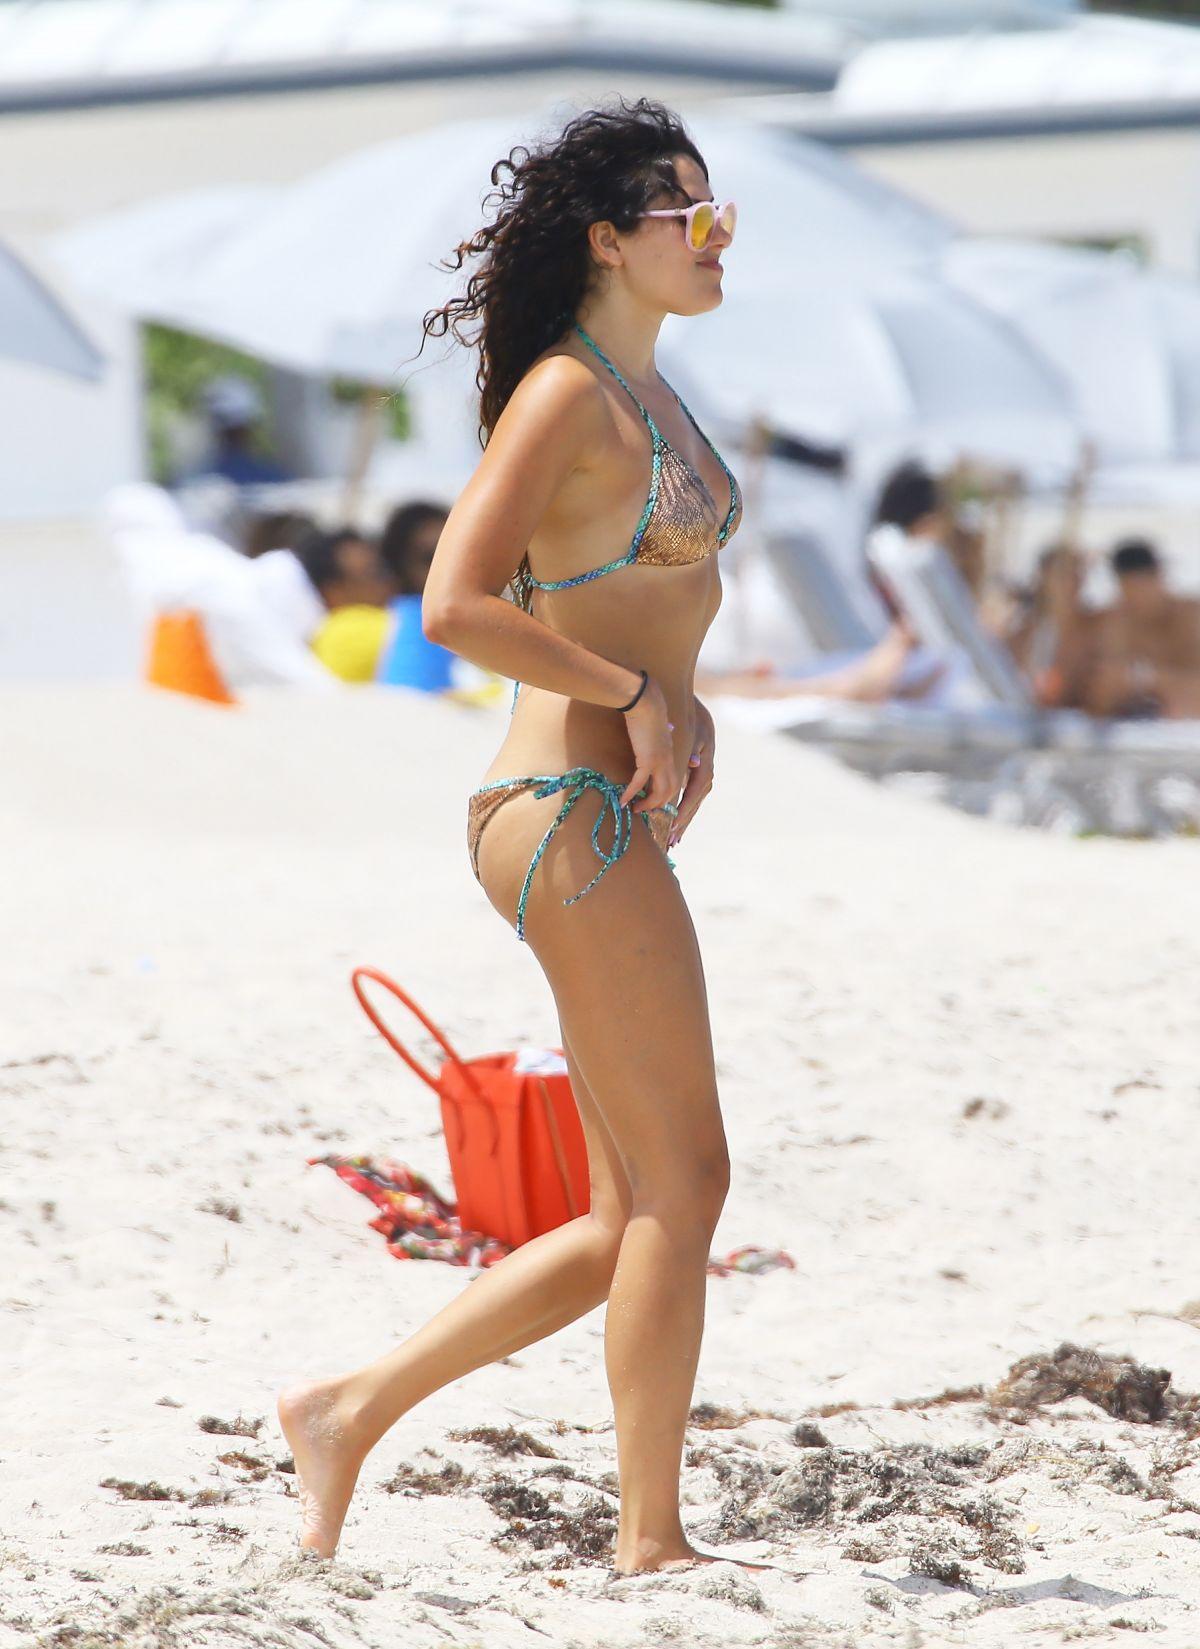 Bikini Eliza Doolittle nudes (19 photo), Ass, Bikini, Boobs, bra 2015